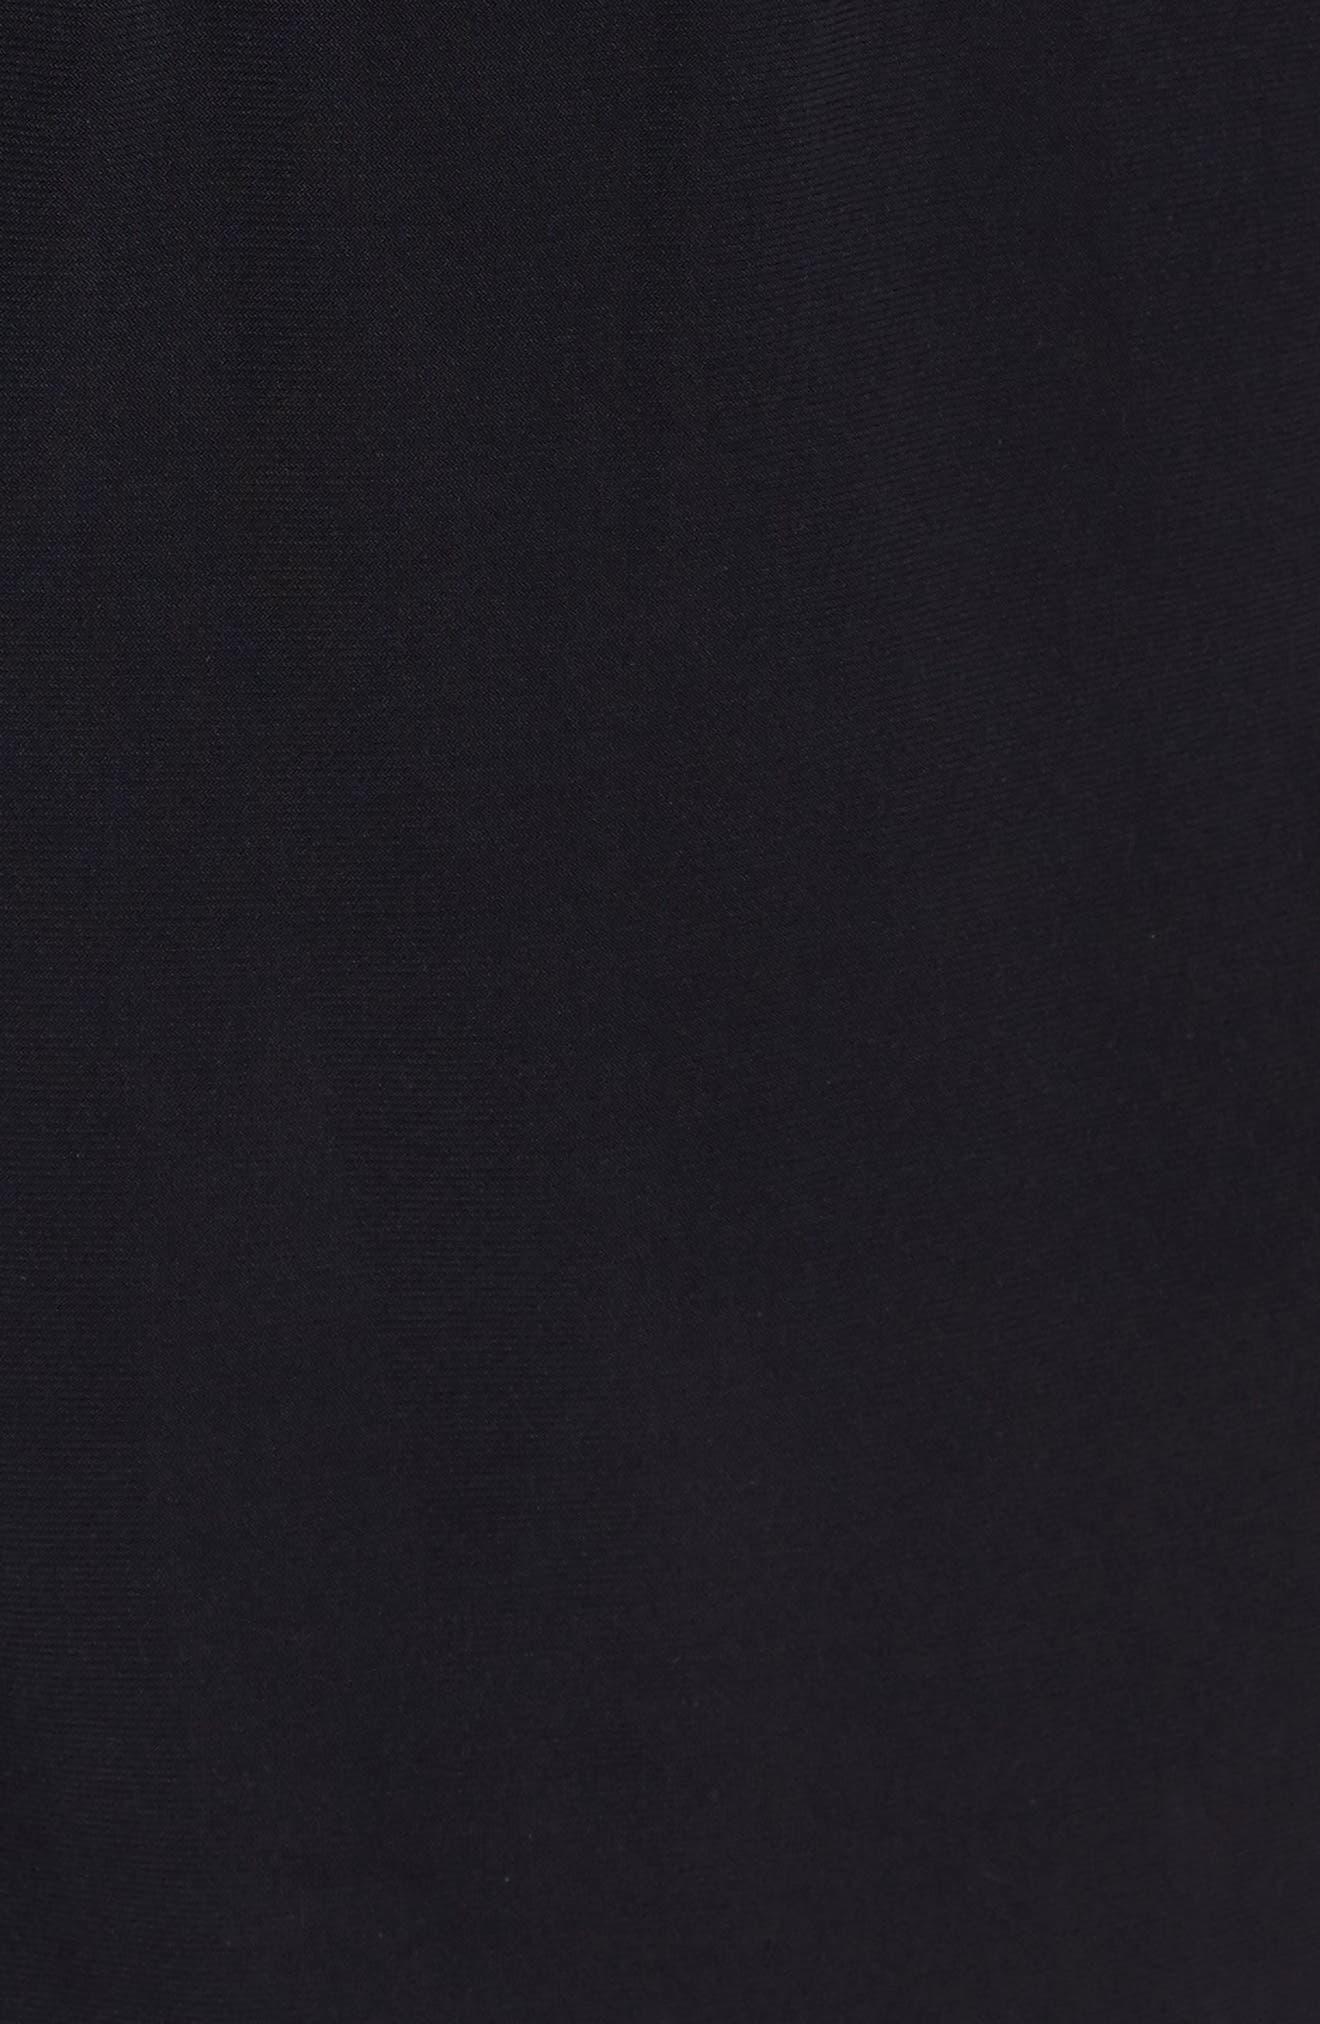 Bianca One-Piece Romper Swimsuit,                             Alternate thumbnail 5, color,                             Black